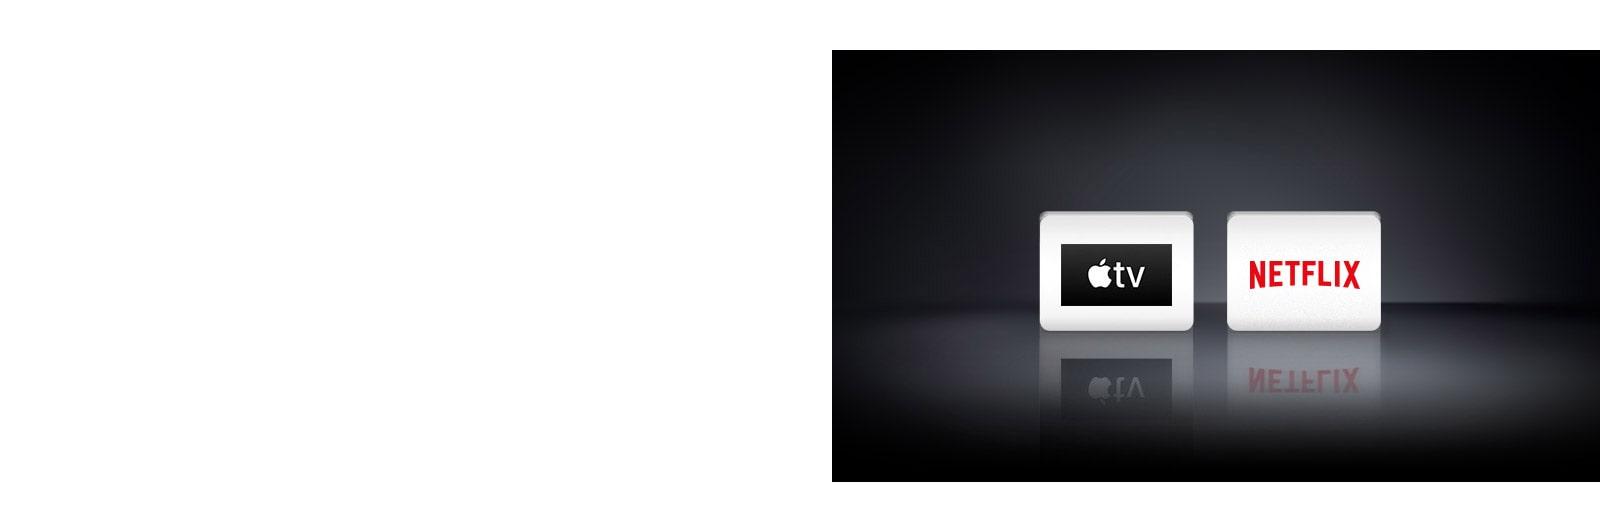 Tři loga: aplikace Apple TV, Netflix